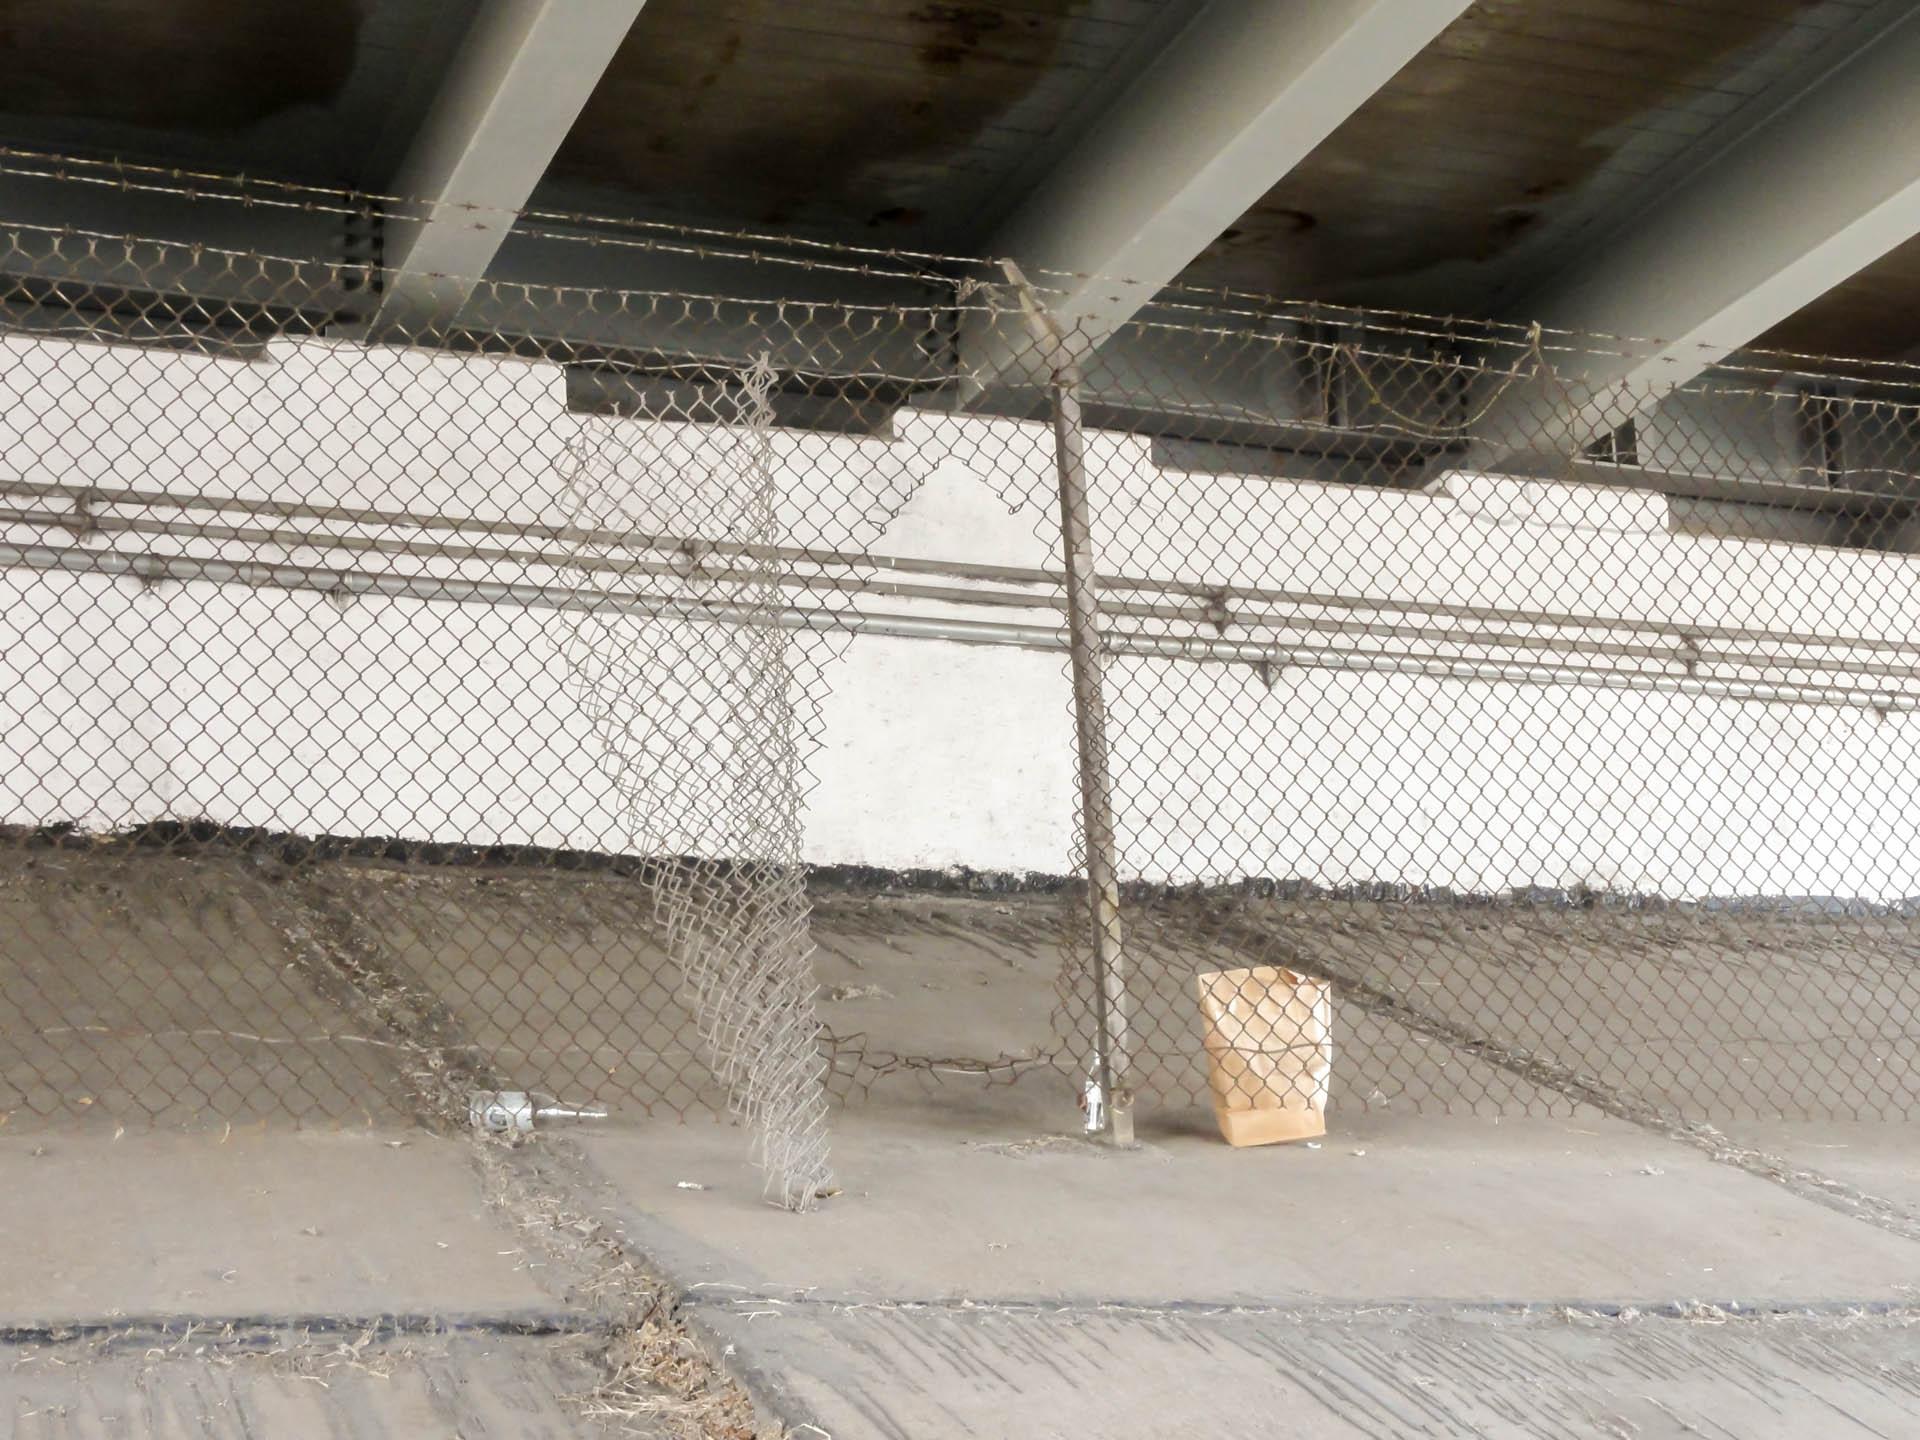 Overpass Enclosure